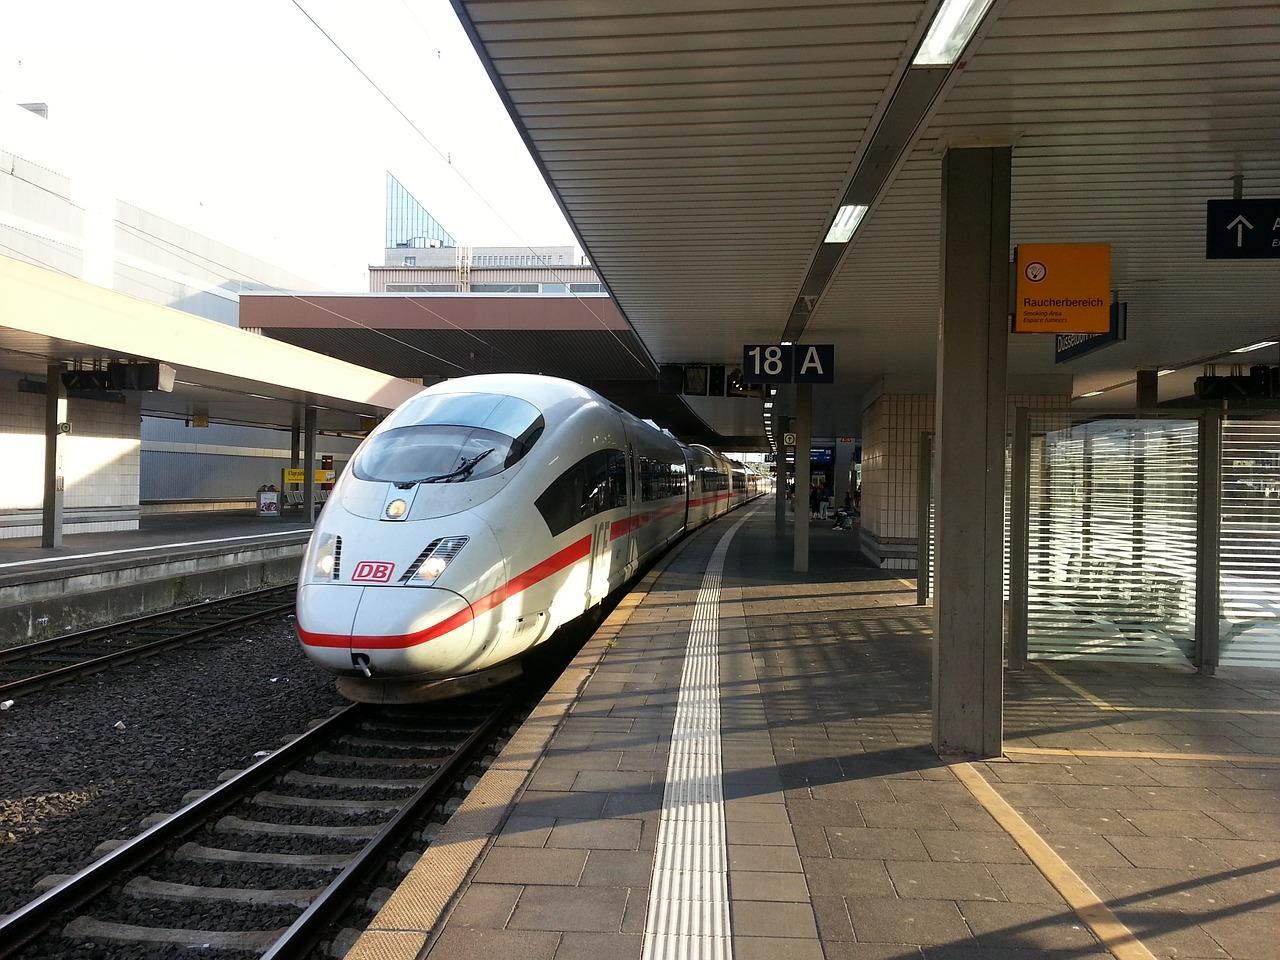 deutschland-nomade-bahncard-bahncard-city-ticket